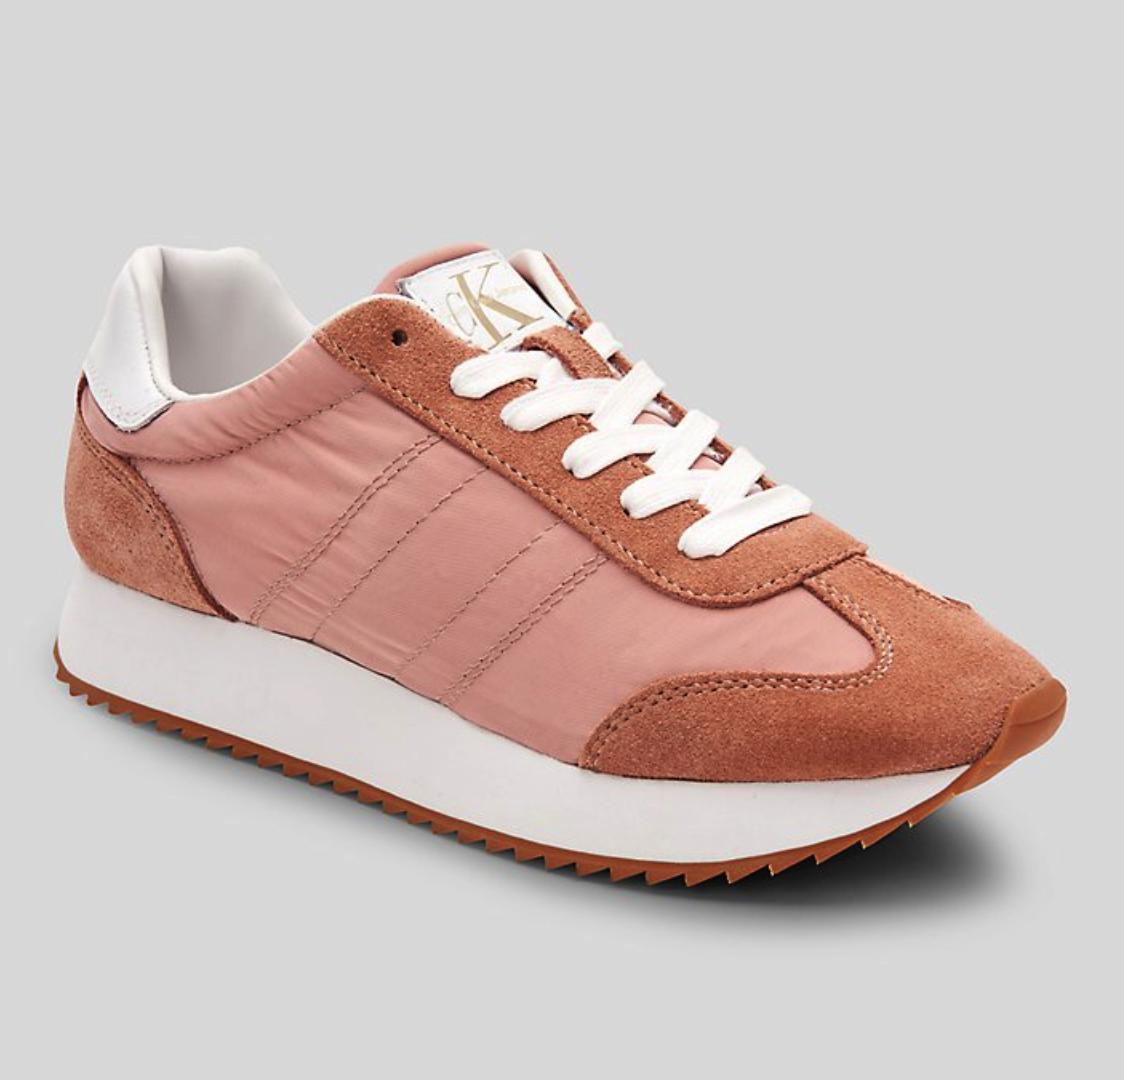 "Calvin Klein Colete Nylon Suede Sneaker in ""Dusk"" $99, CalvinKlein.com"